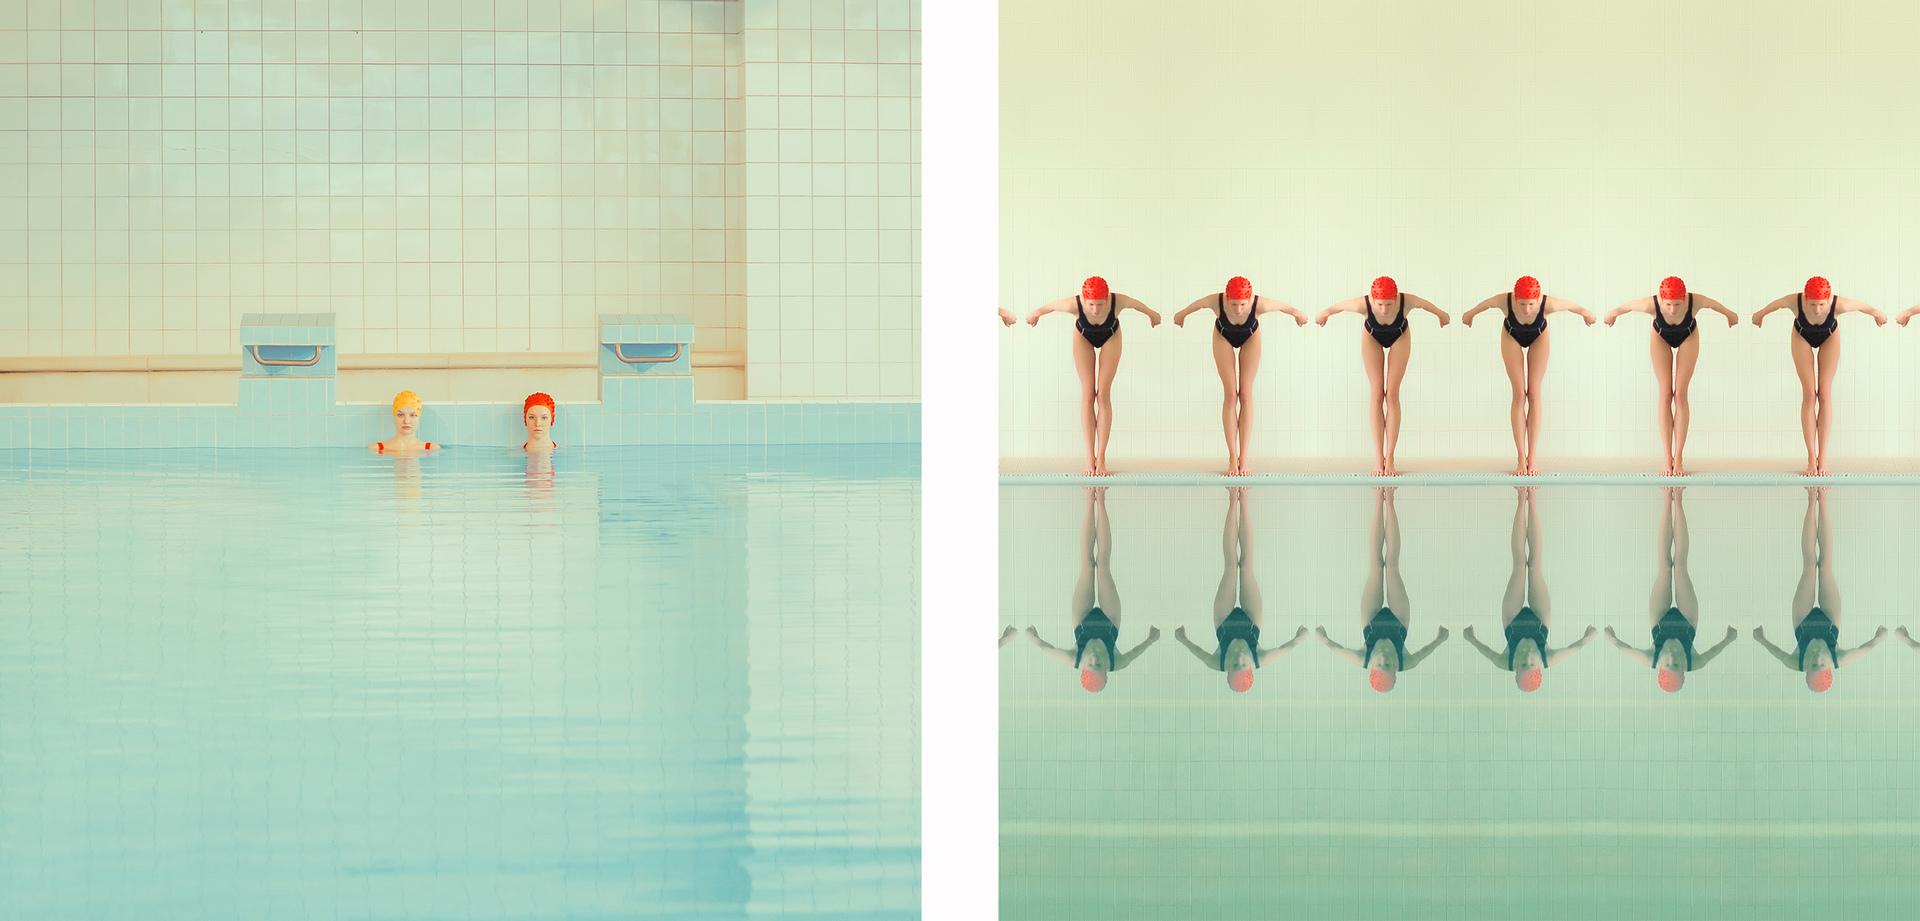 Swimming pool by Maria Svarbova